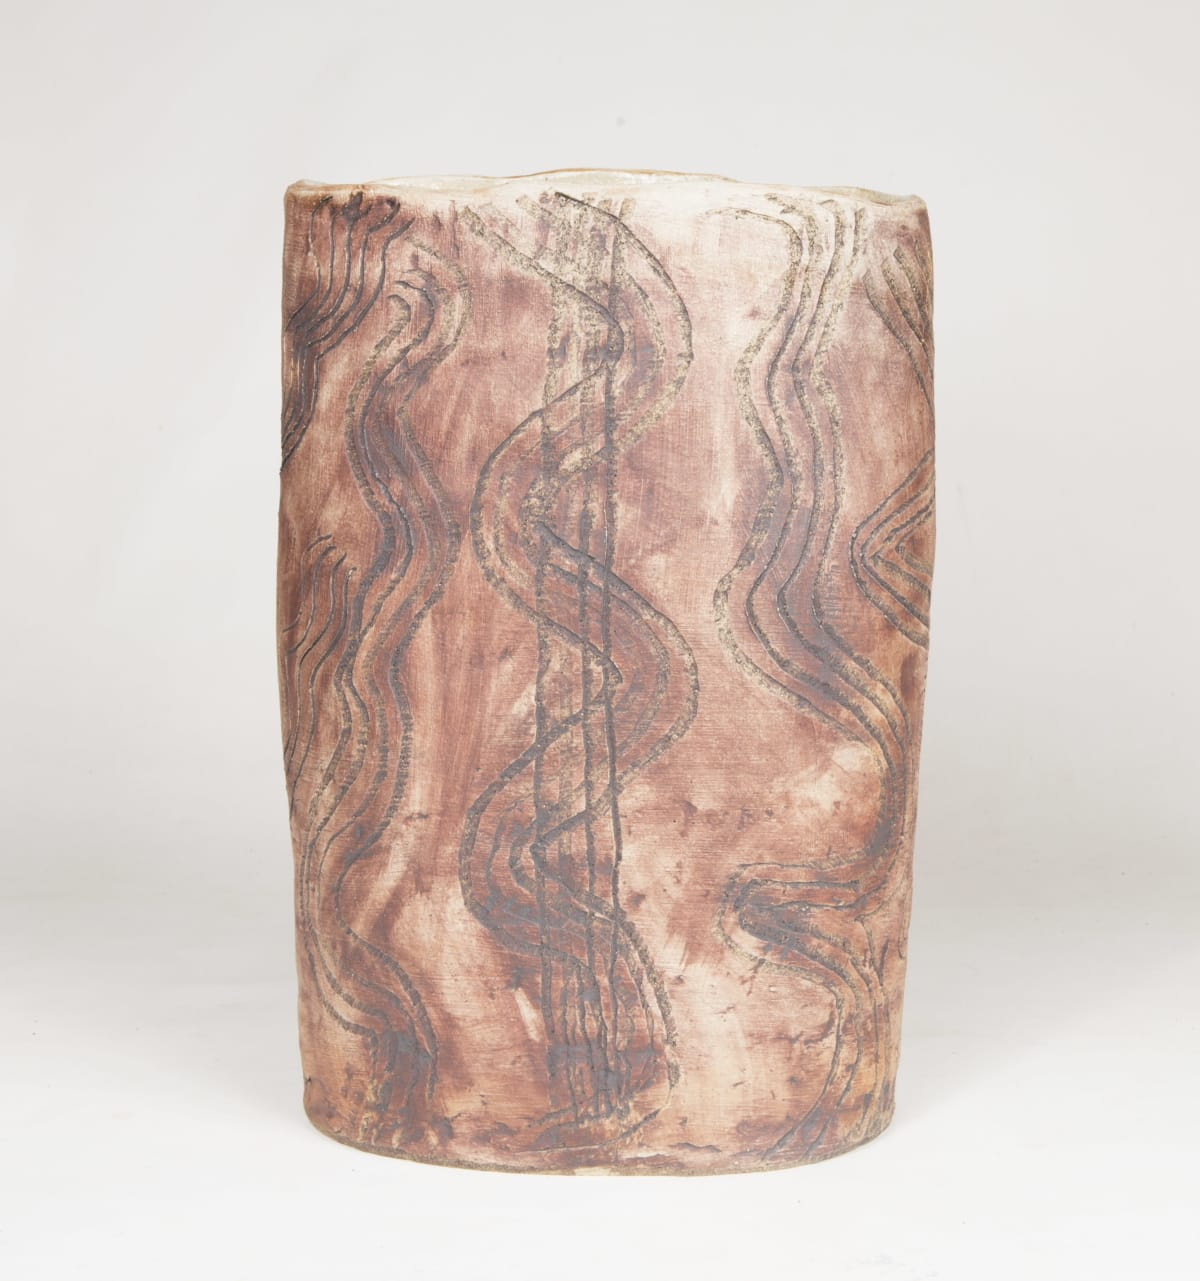 Rupert Jack Maku Maku, 2018 Stoneware 43 x 30 cm